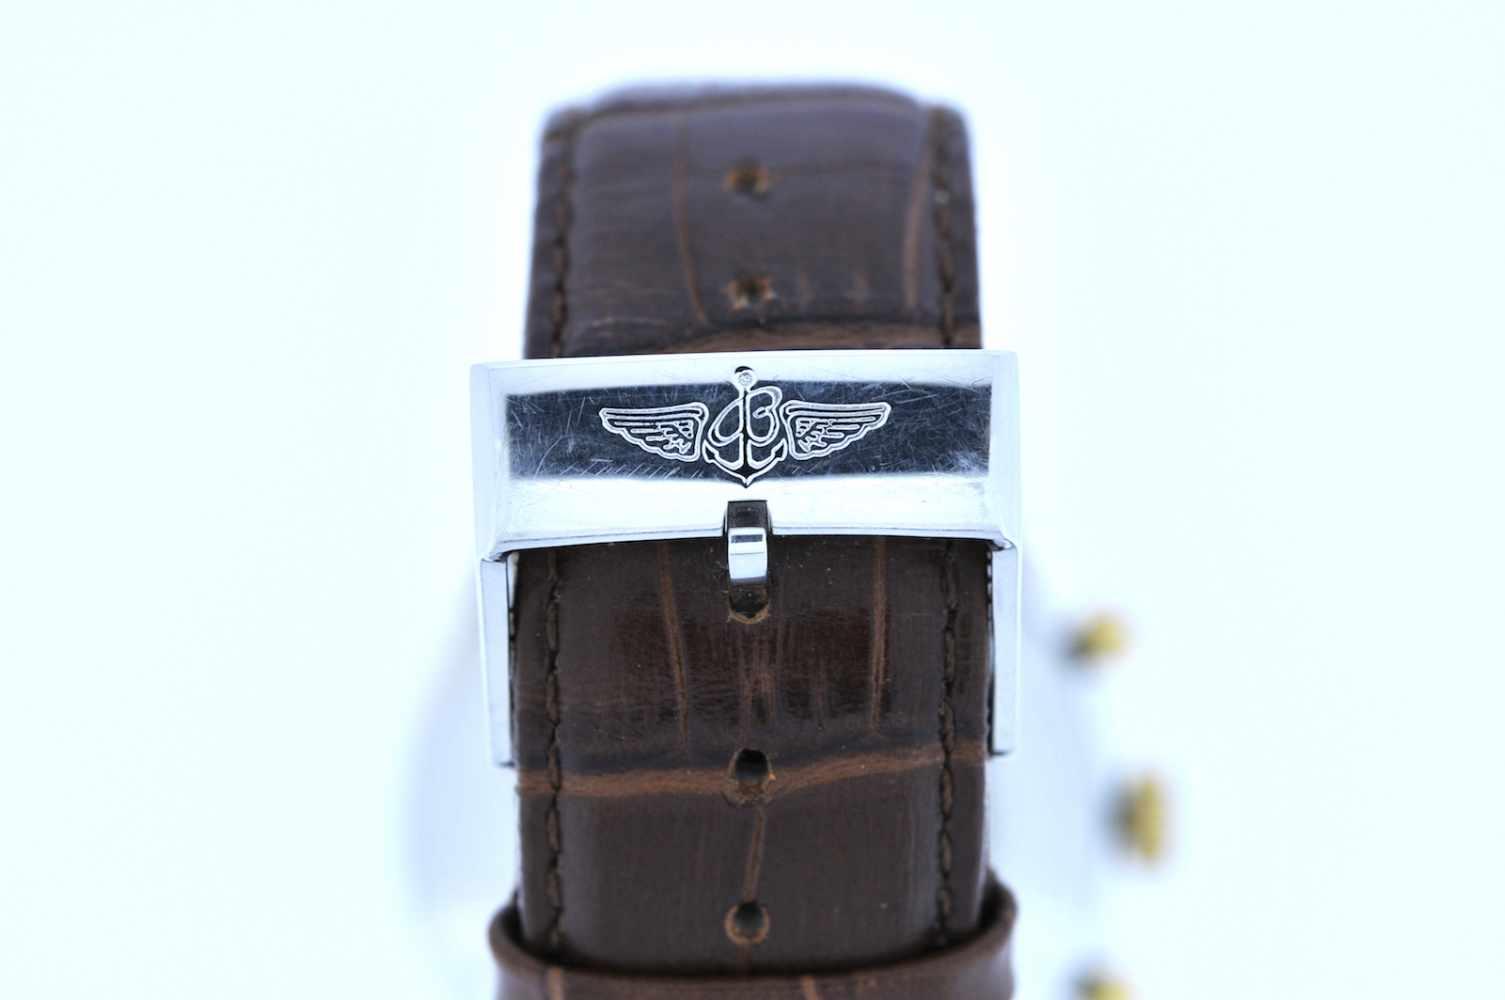 Breitling Stahl vergoldete Armbanduhr an Lederband, Breitling Navitimer, Fliegerchronograph, - Bild 2 aus 5